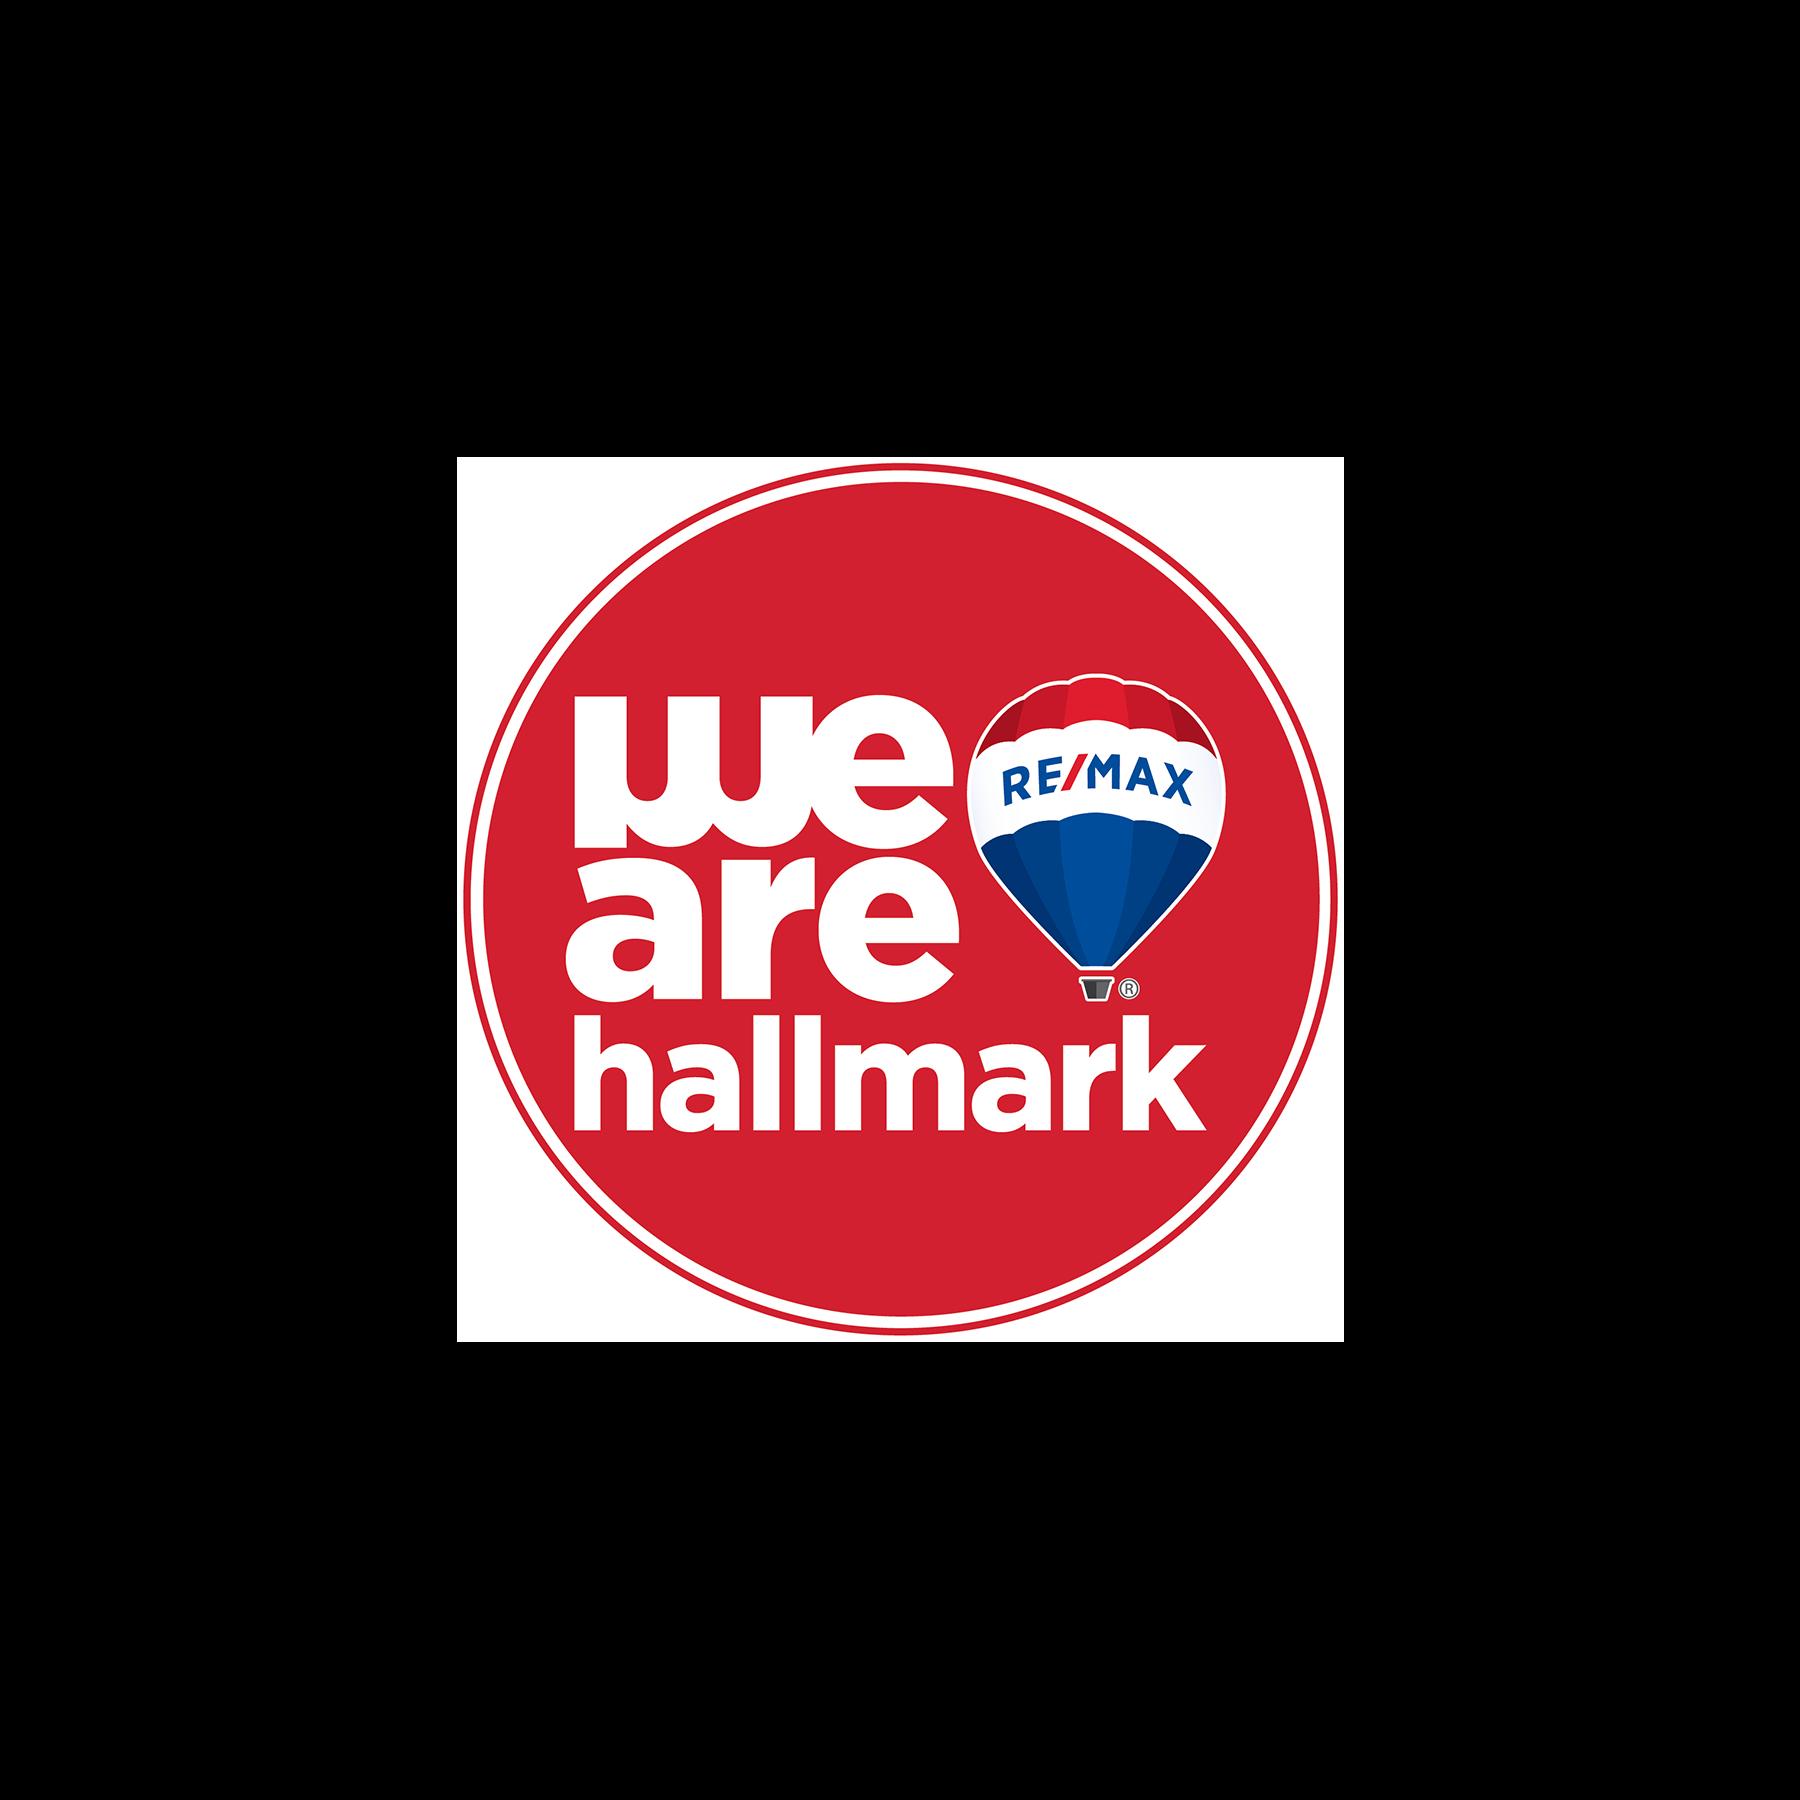 REMAX Hallmark Realty Ltd. Brokerage